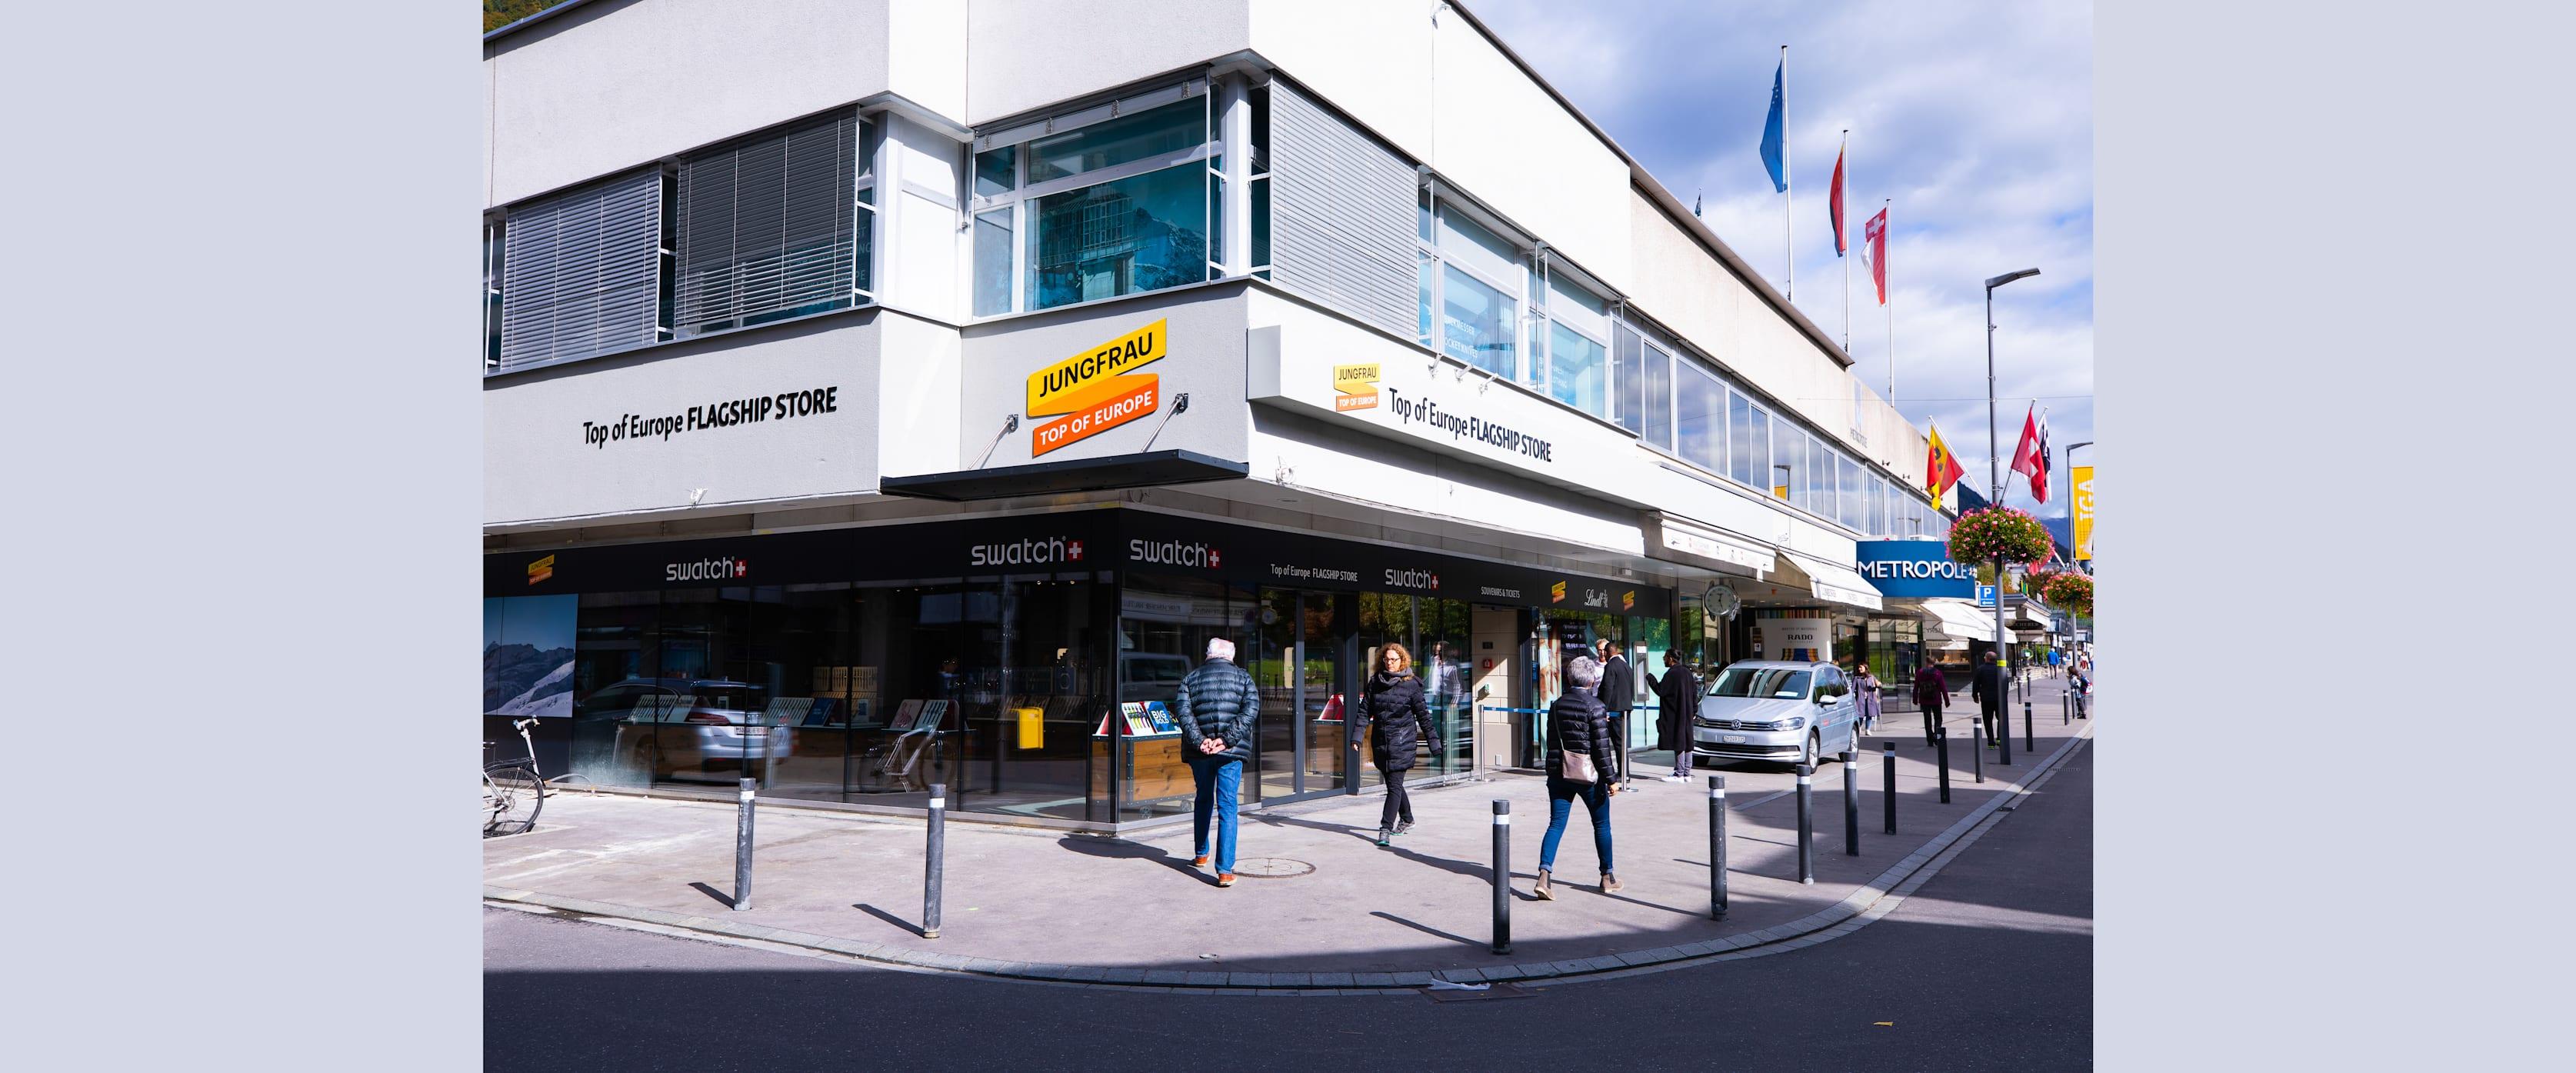 Erlebnisse-Aktivitaeten, Top of Europe Flagship Store